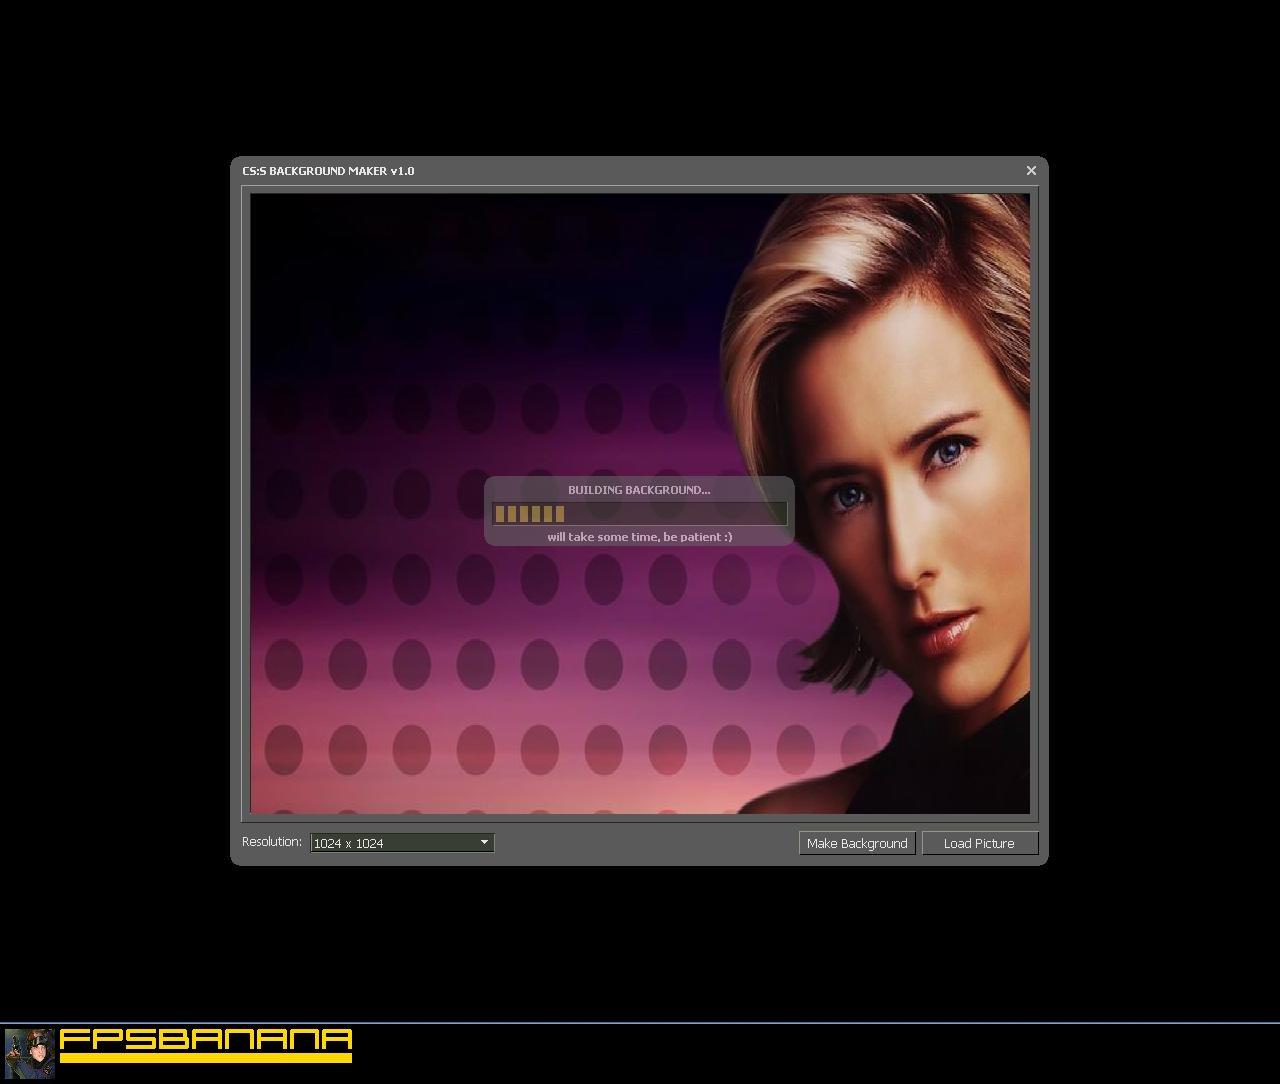 Background image maker - Cs S Background Maker V1 0